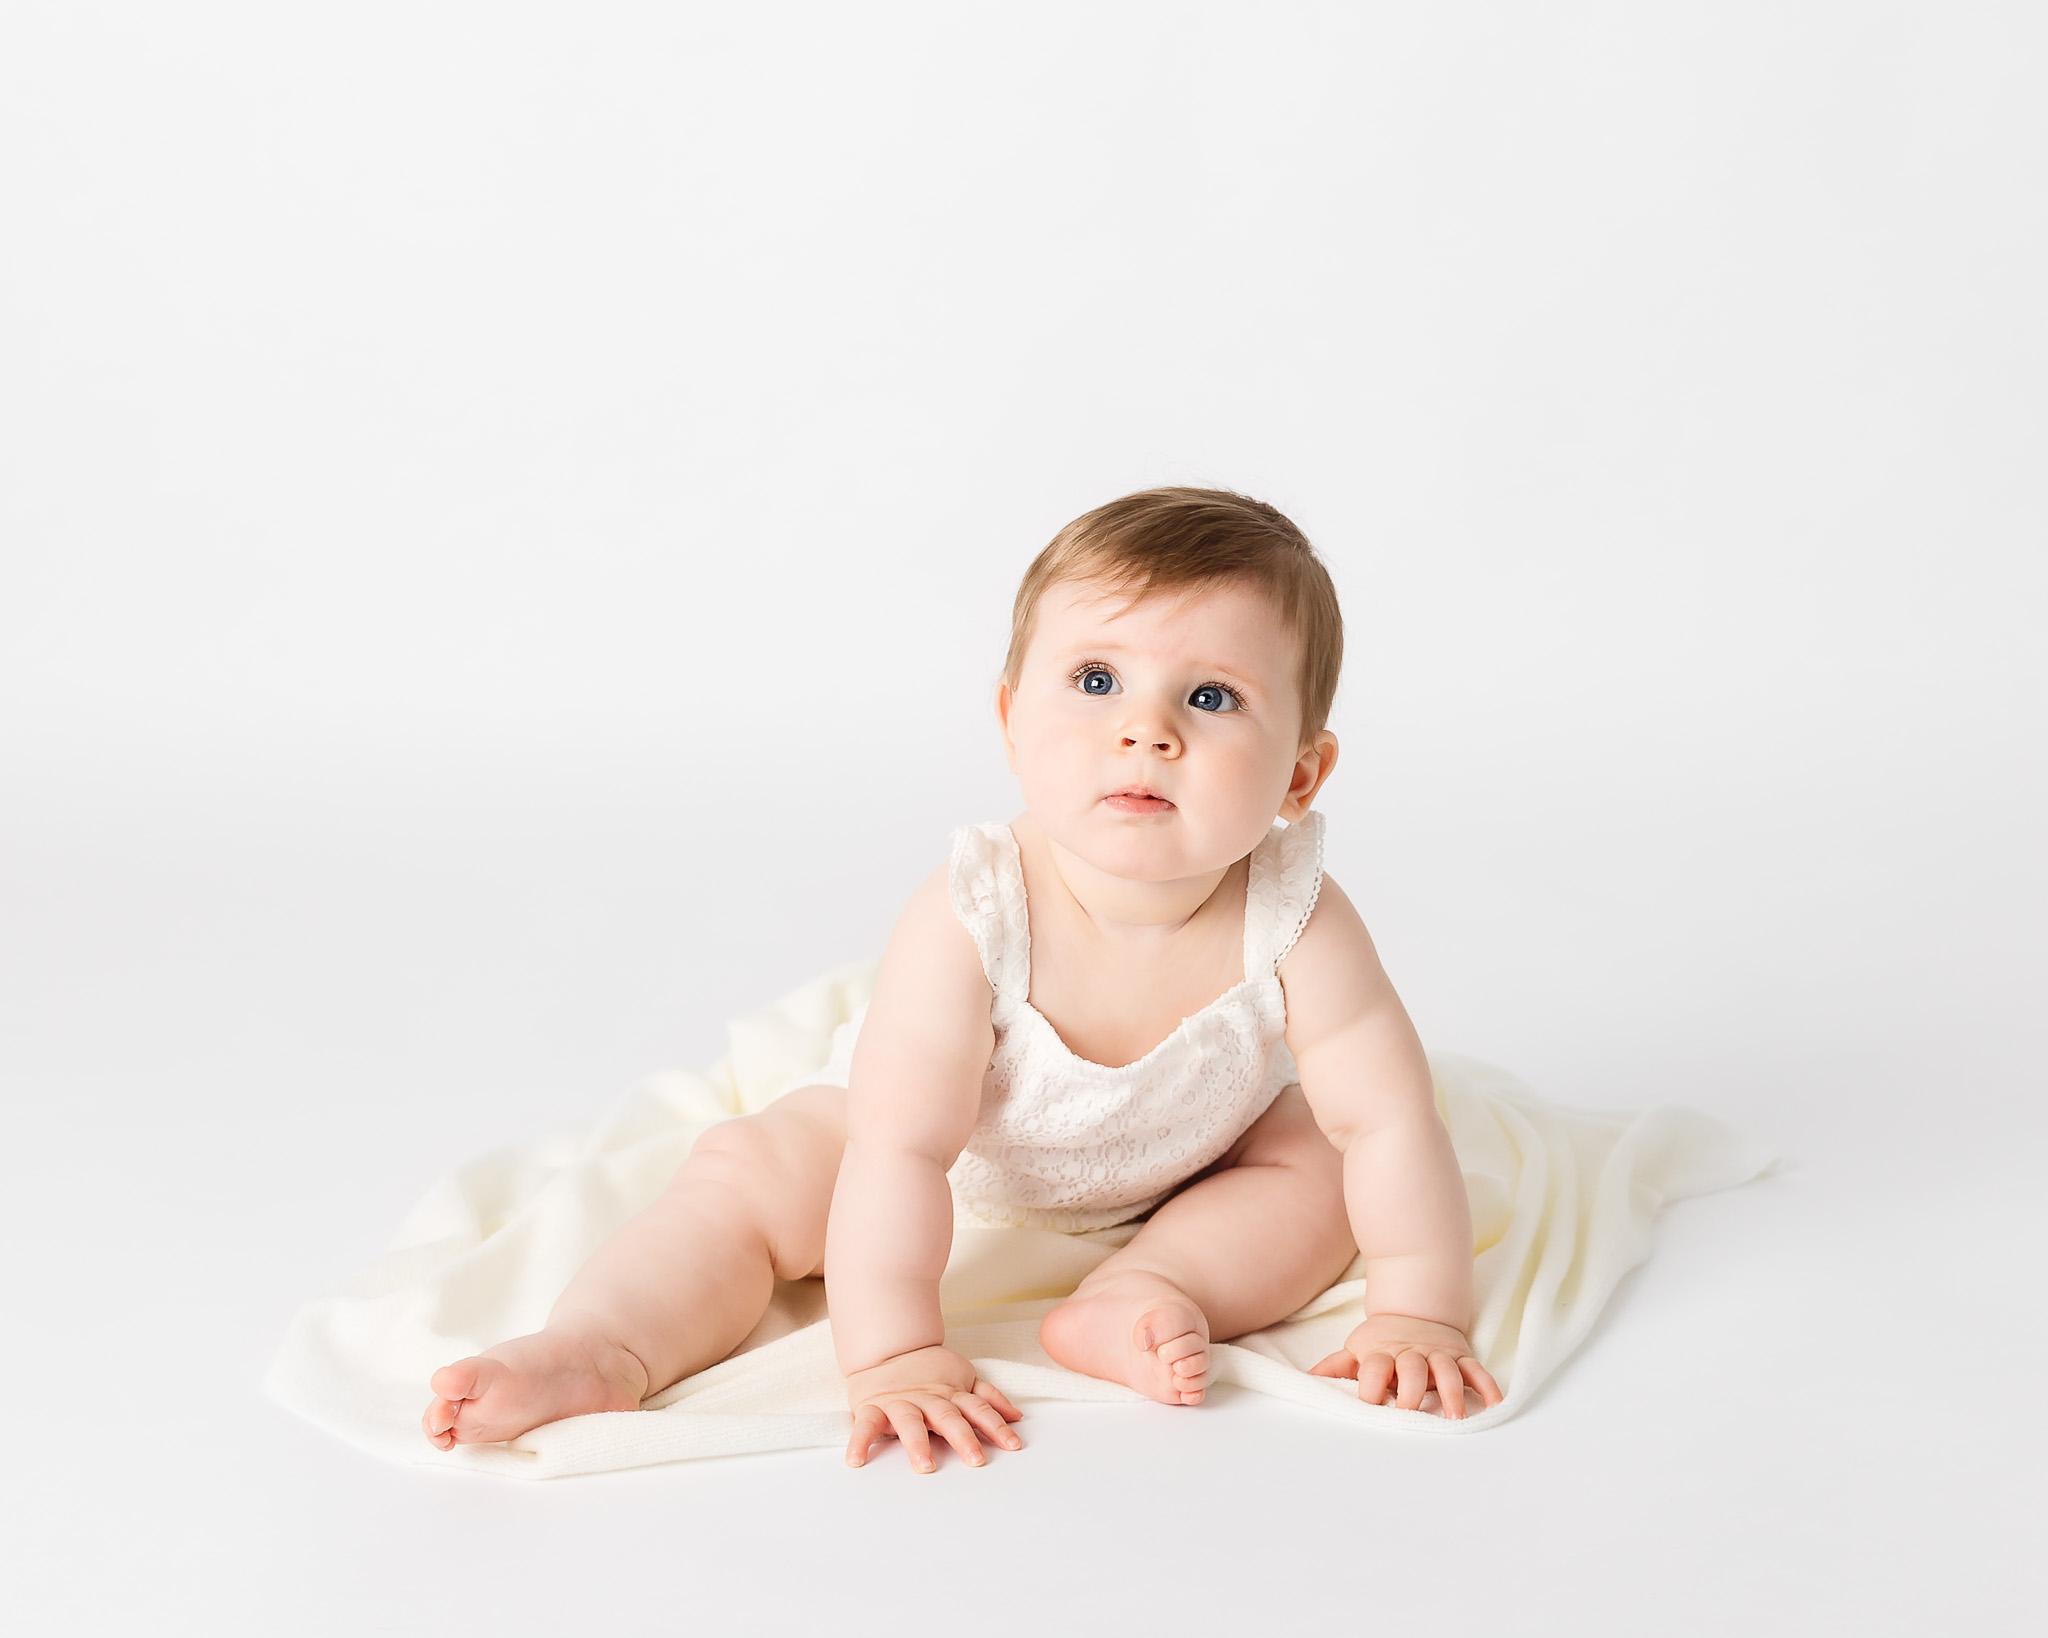 baby photography banchory aberdeenshire photographer-2.jpg